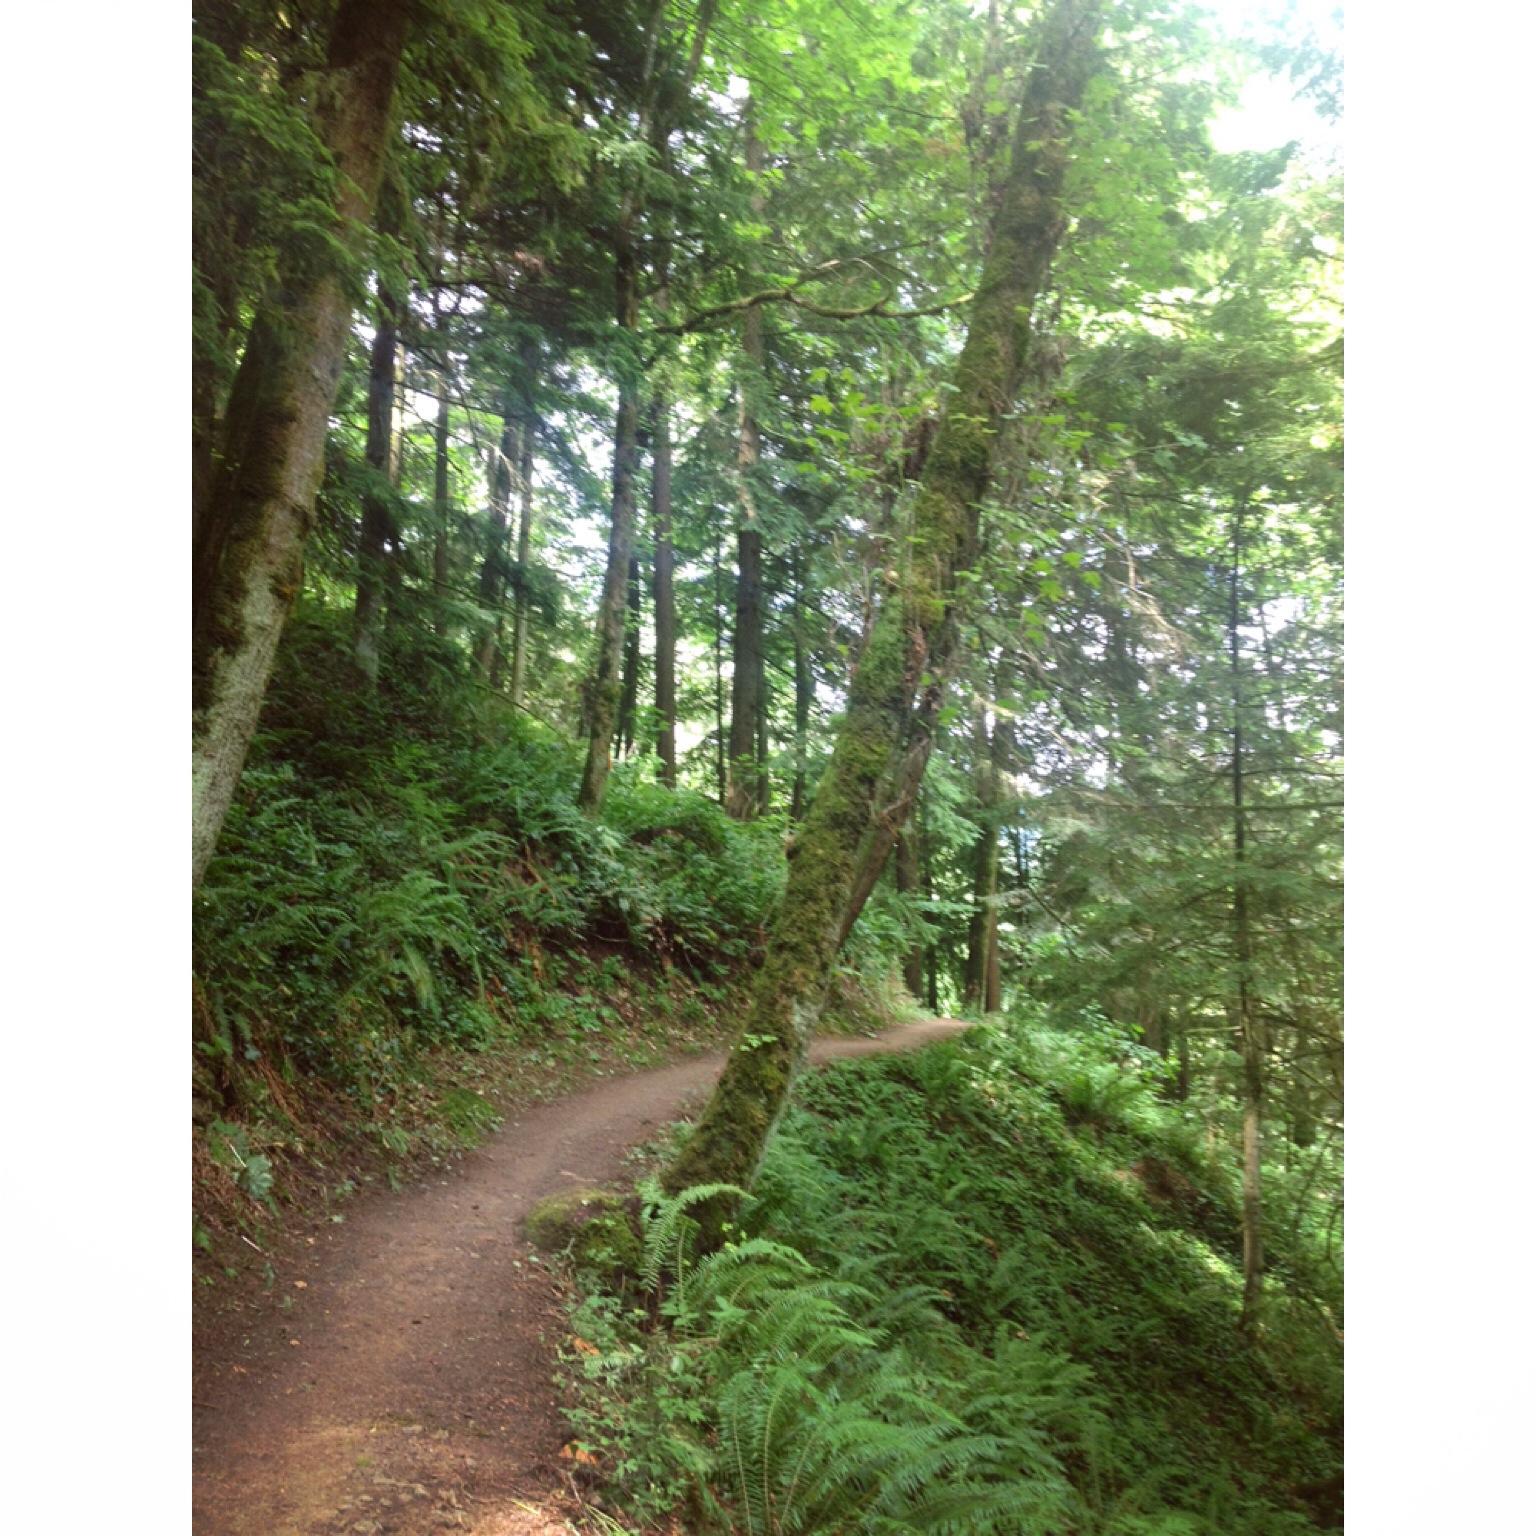 Lower Macleay 6/29/14 downhill